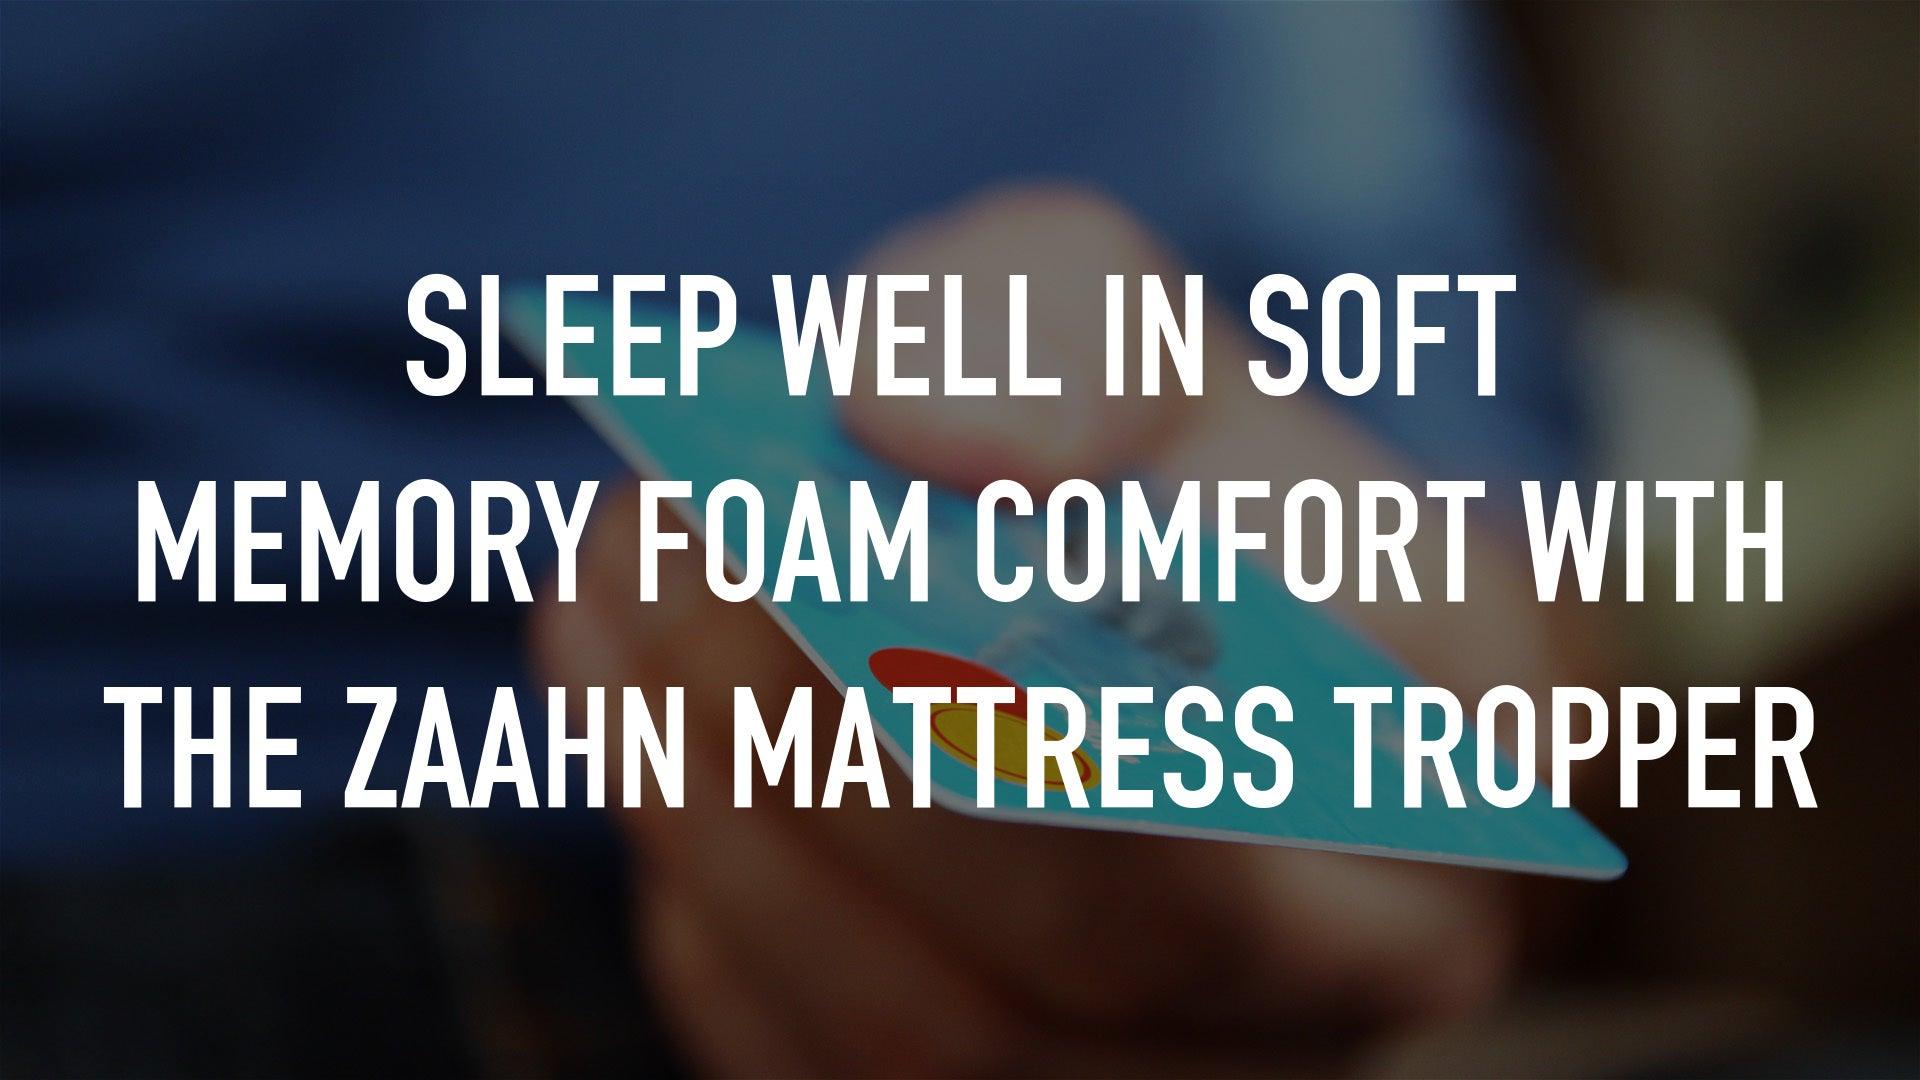 Sleep well in soft memory foam comfort with the Zaahn Mattress Tropper